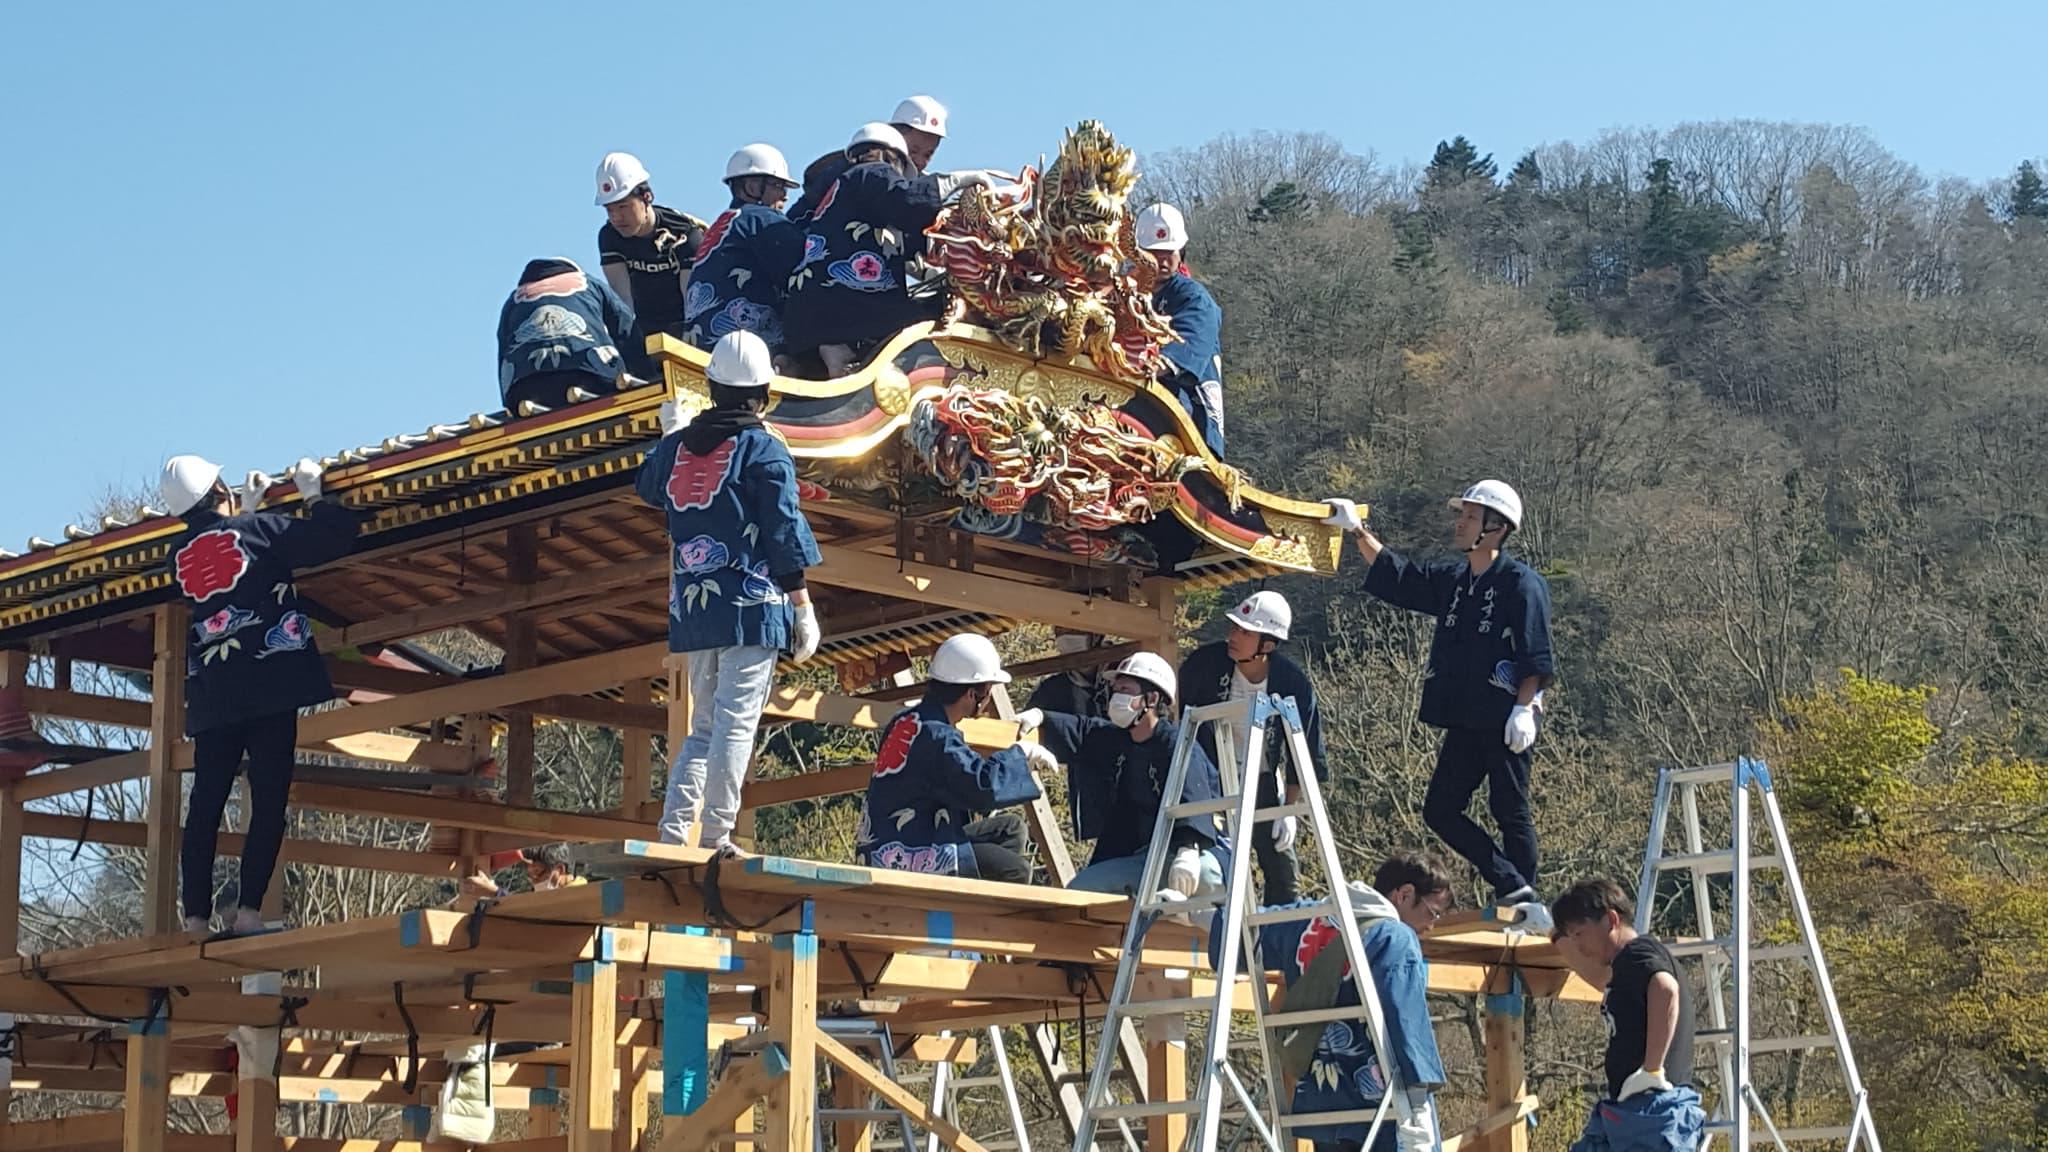 小鹿野春祭り 小鹿野歌舞伎